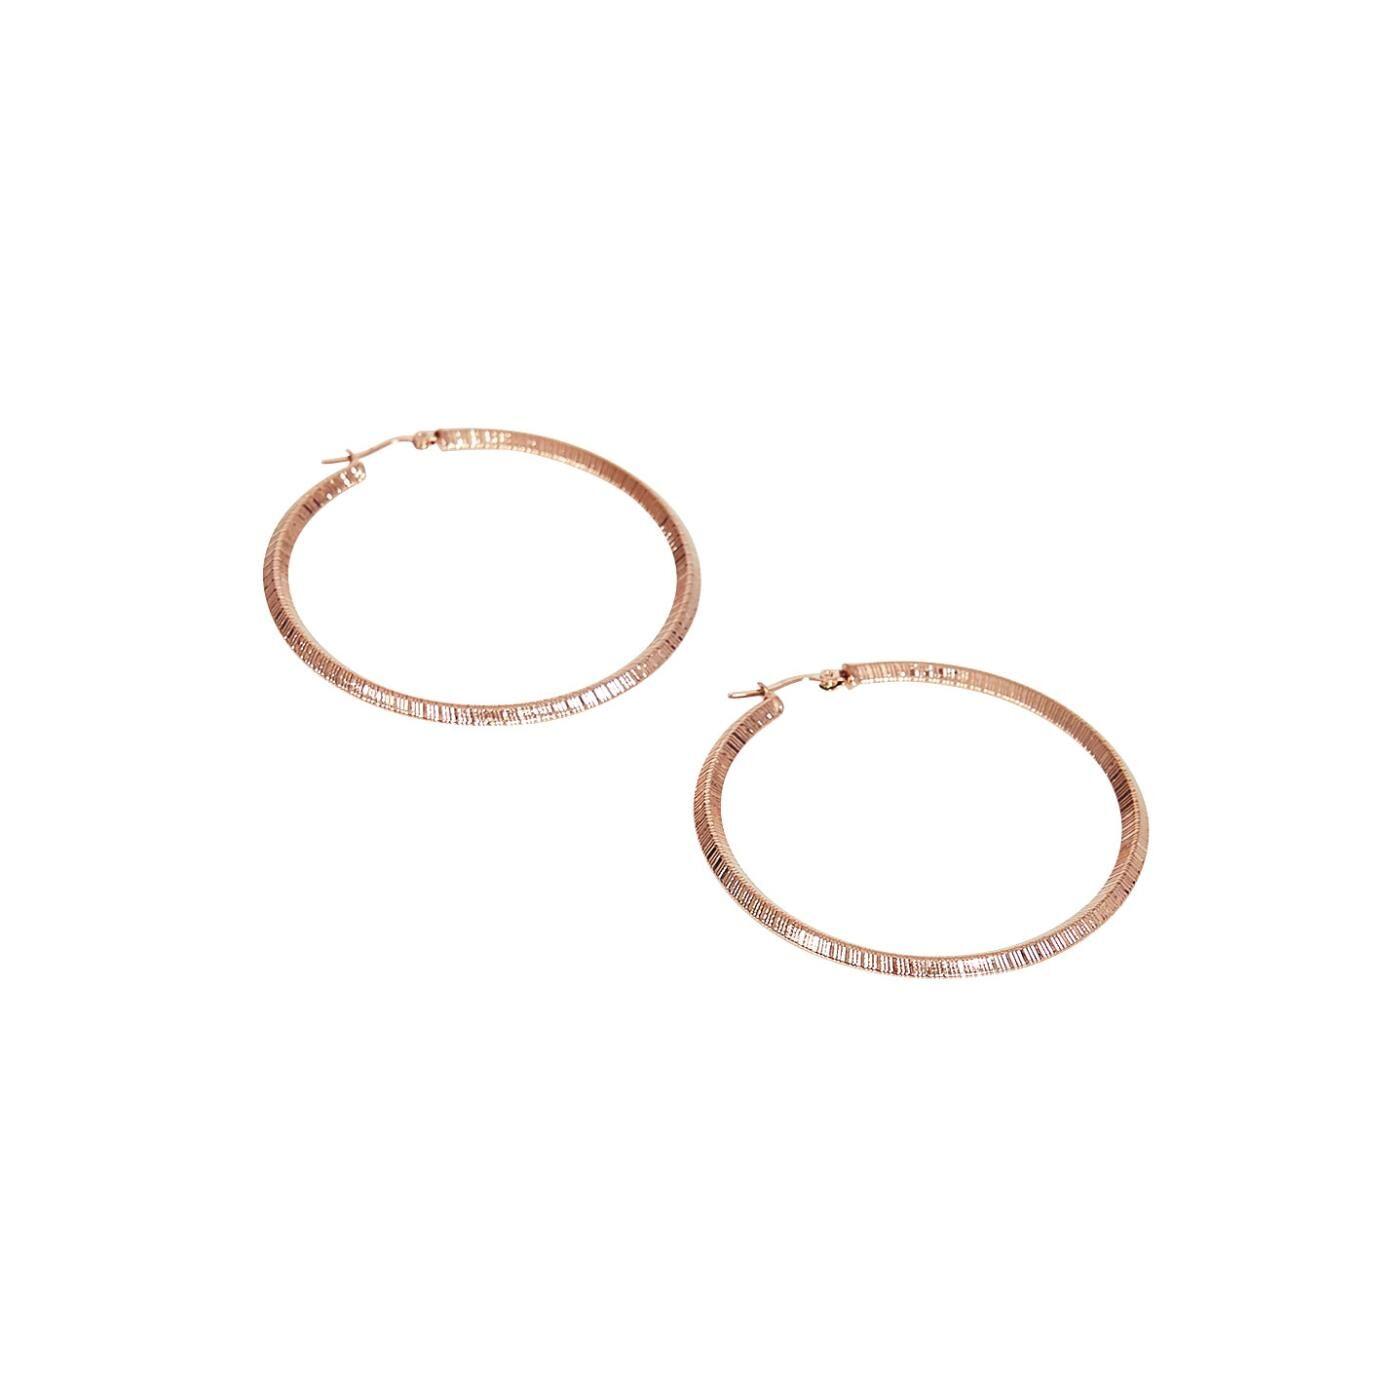 Celestino Ανάγλυφα σκουλαρίκια κρίκοι  - Ροζ - Grootte: One Size